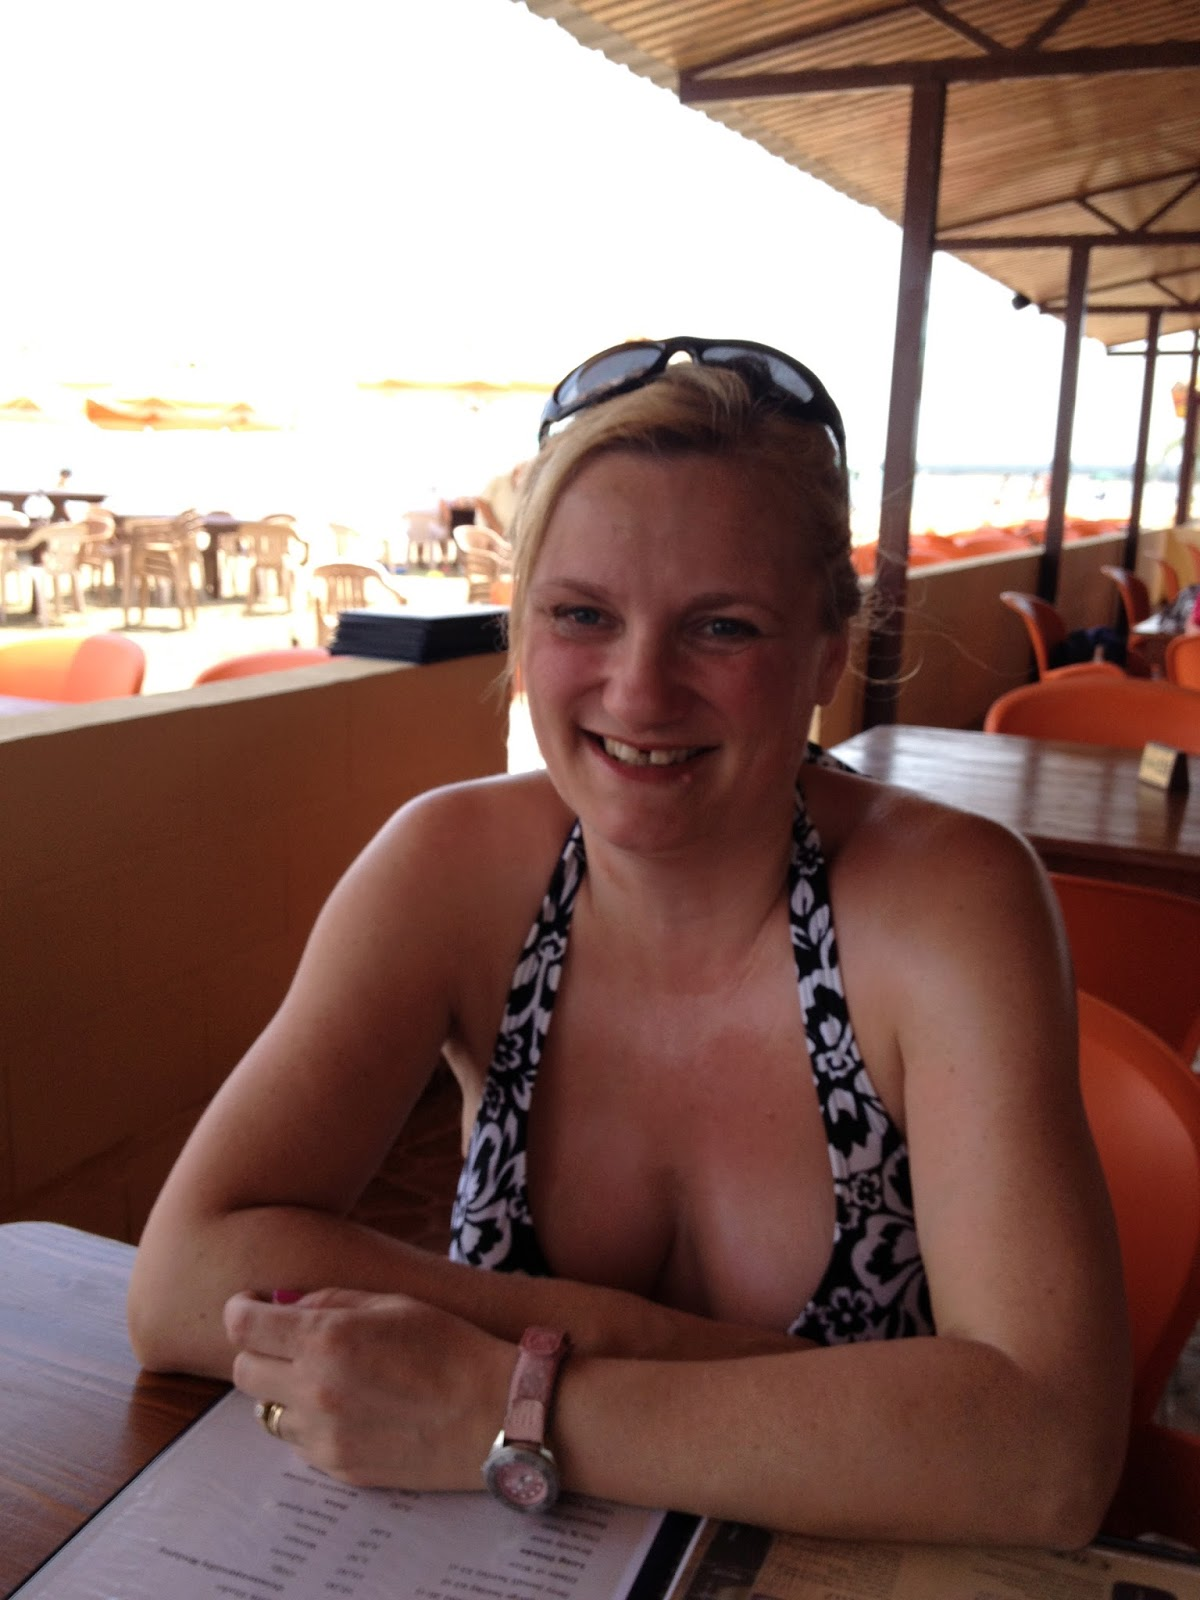 madmumof7  at Ladys Mile Beach, Cyprus in bikini